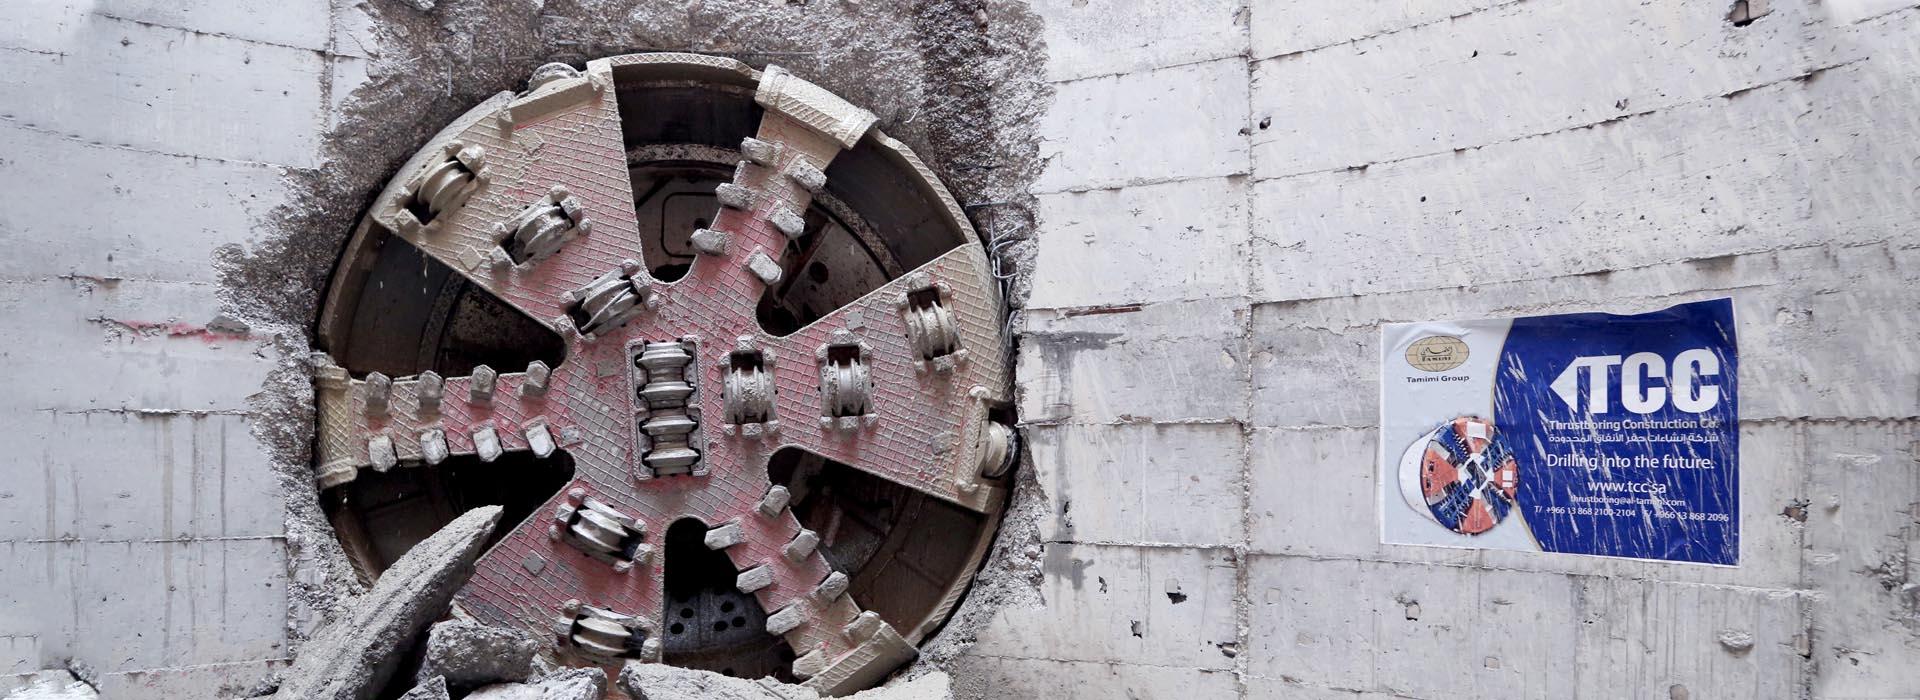 TCC - Thrustboring Construction Co - شركة إنشاءات حفر